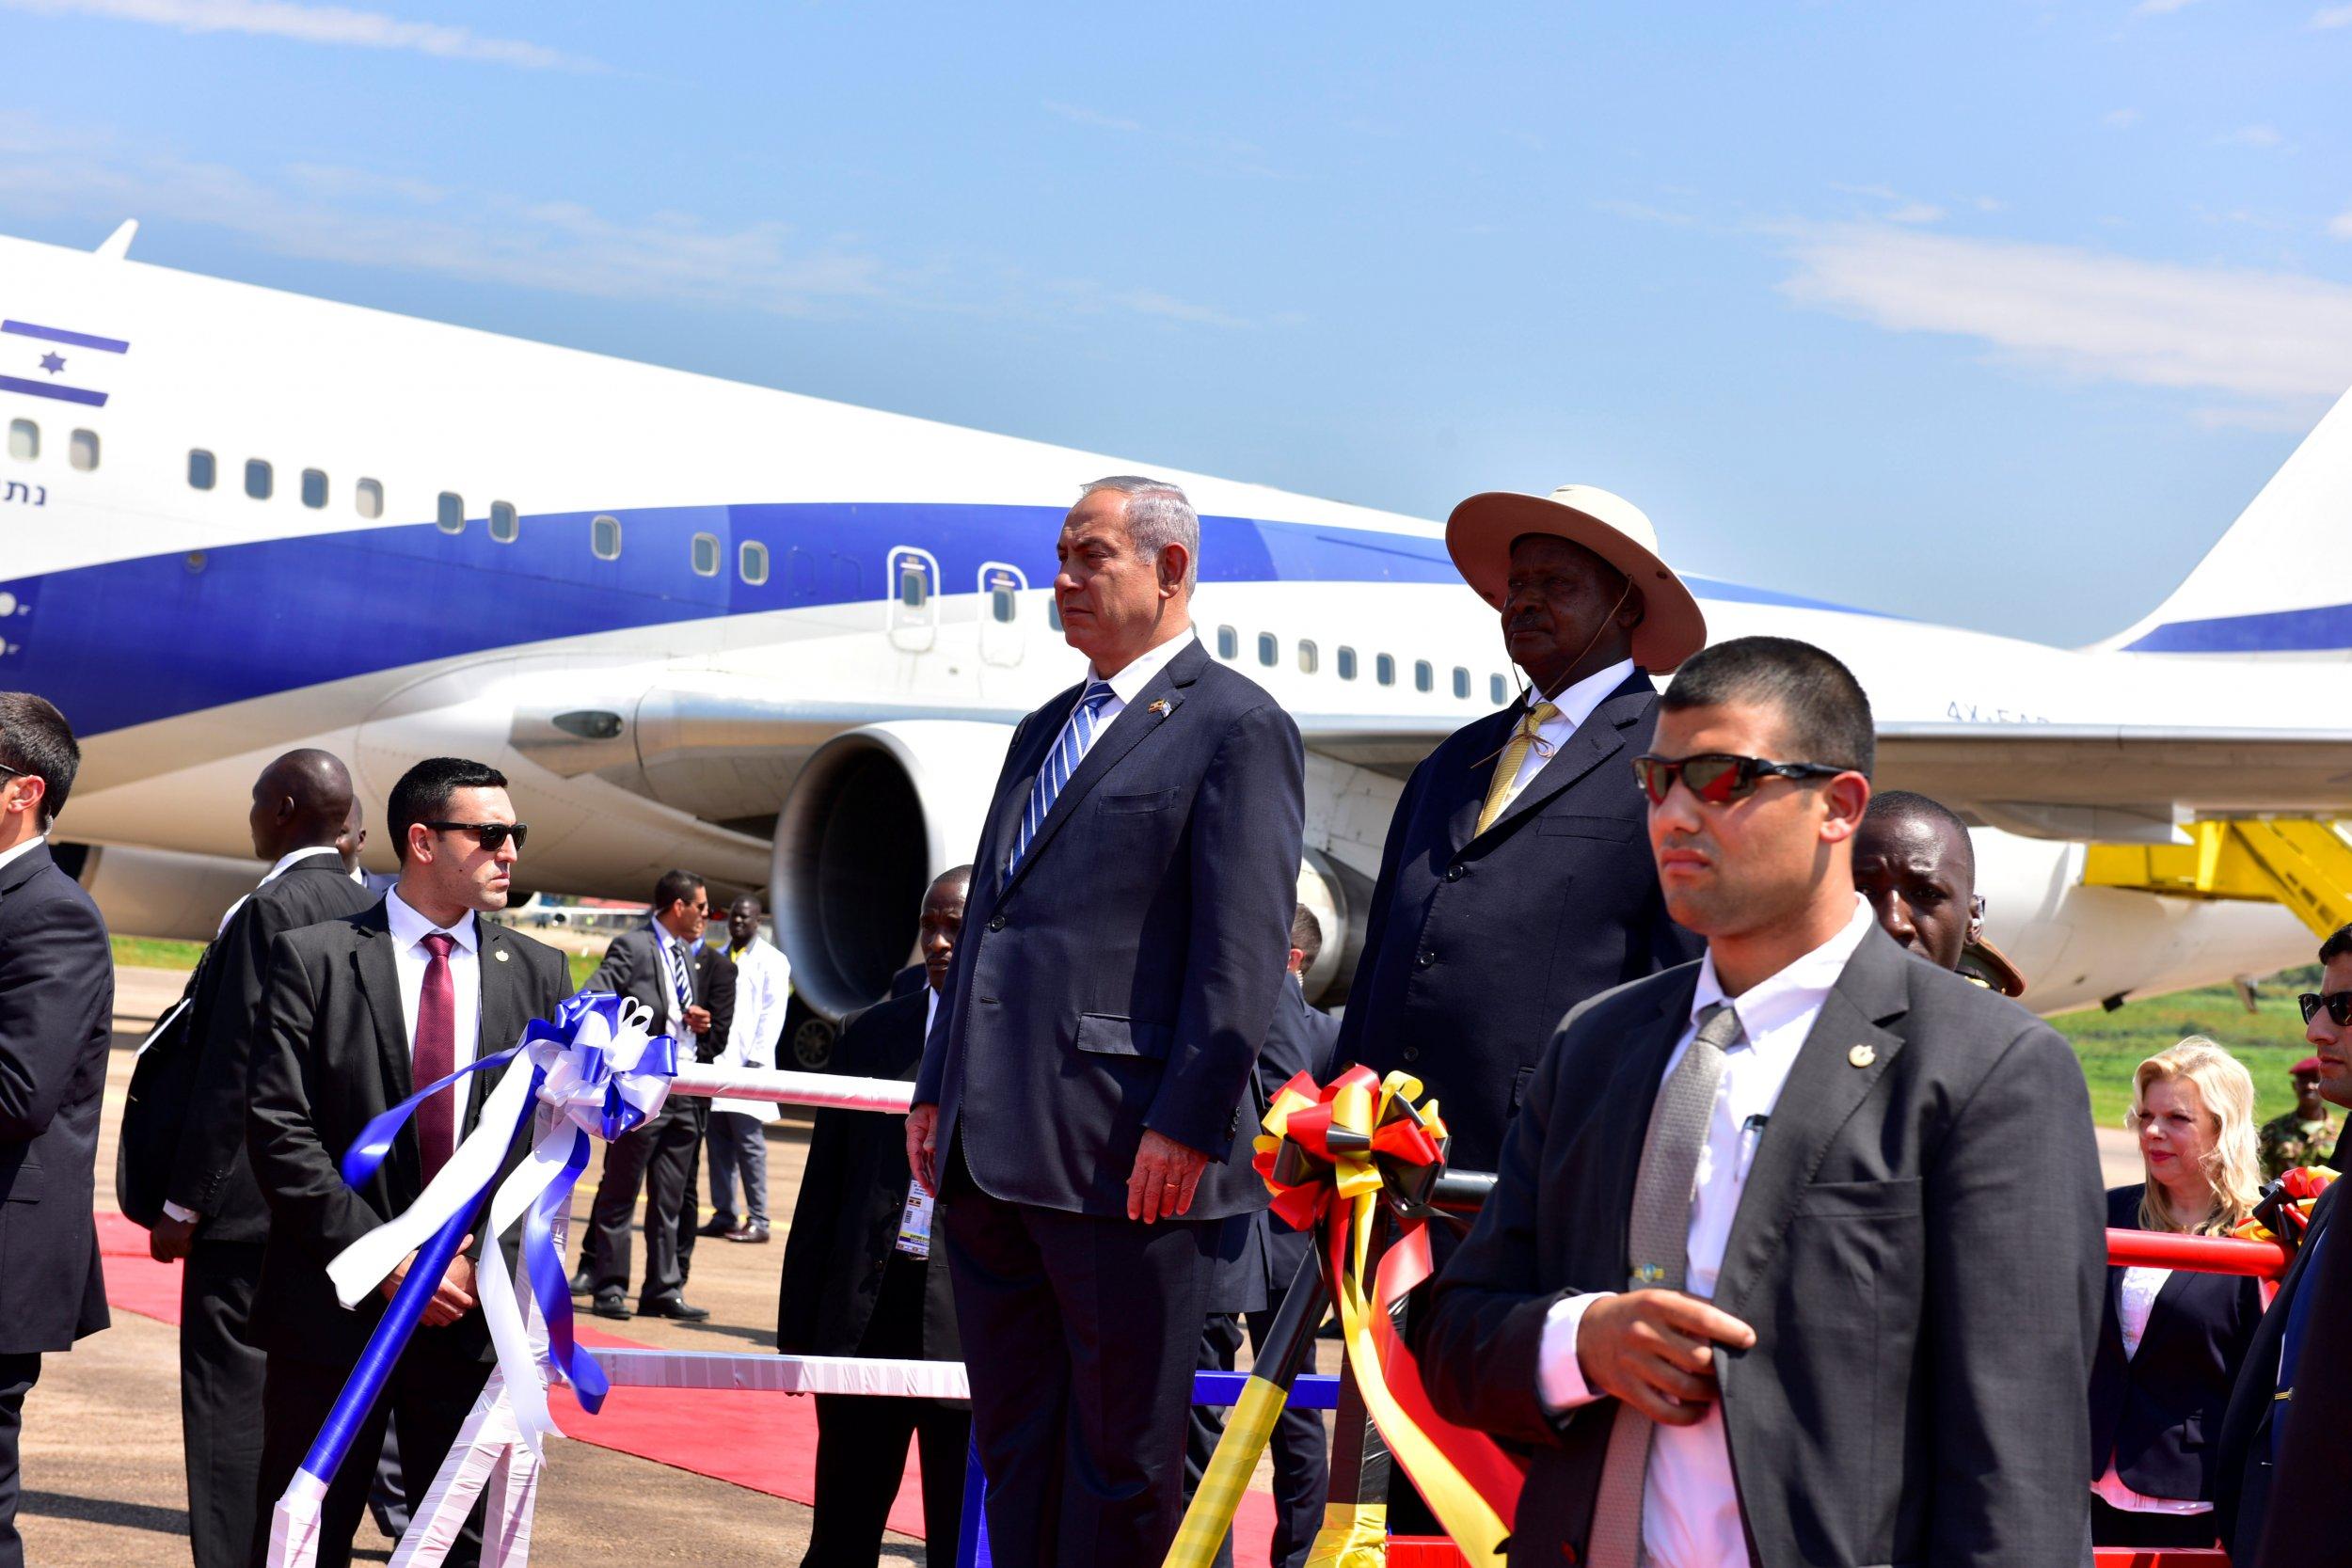 Netanyahu and Museveni